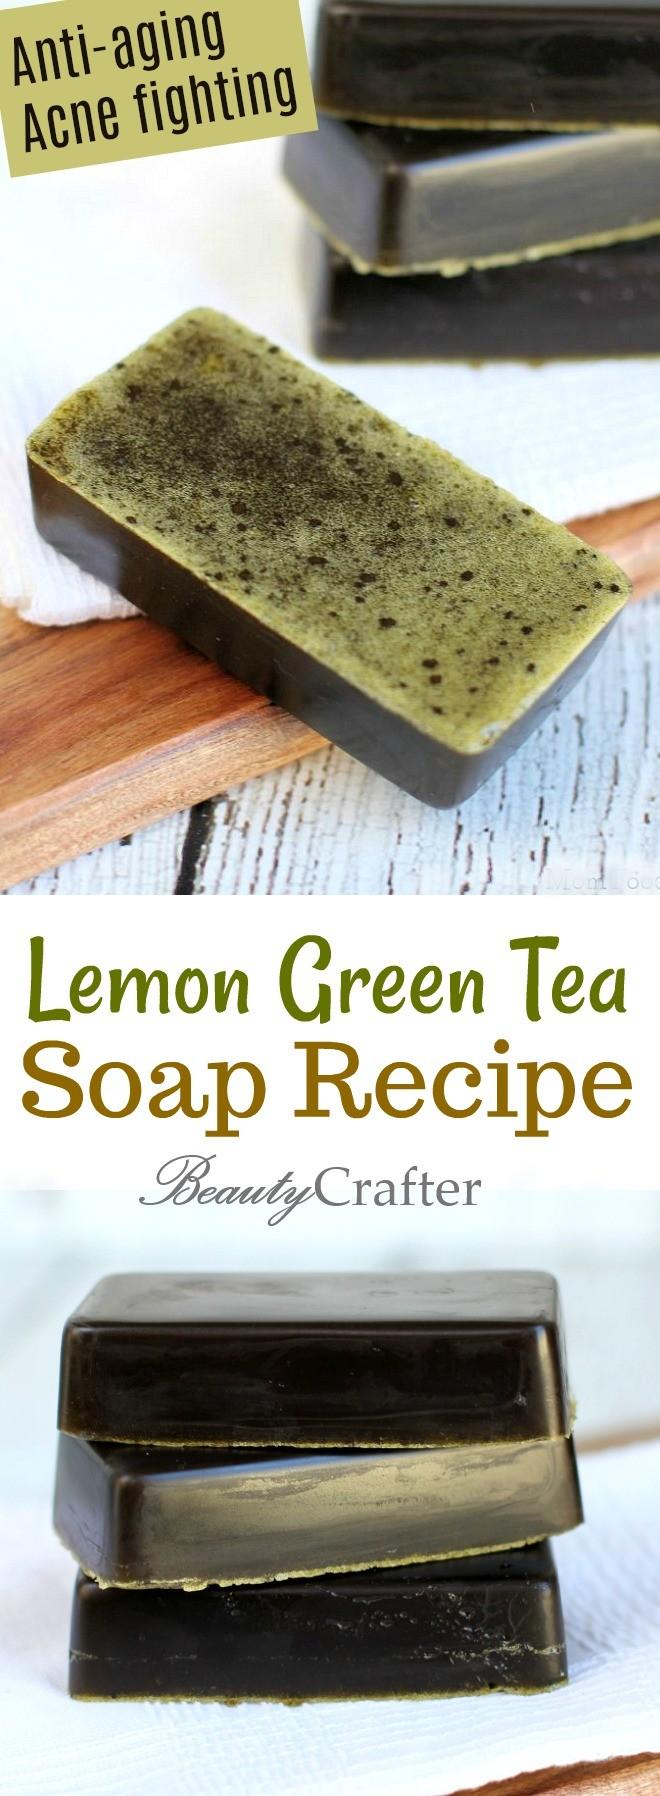 Lemon Green Tea Soap Recipe DIY , anti-aging and acne fighting soap